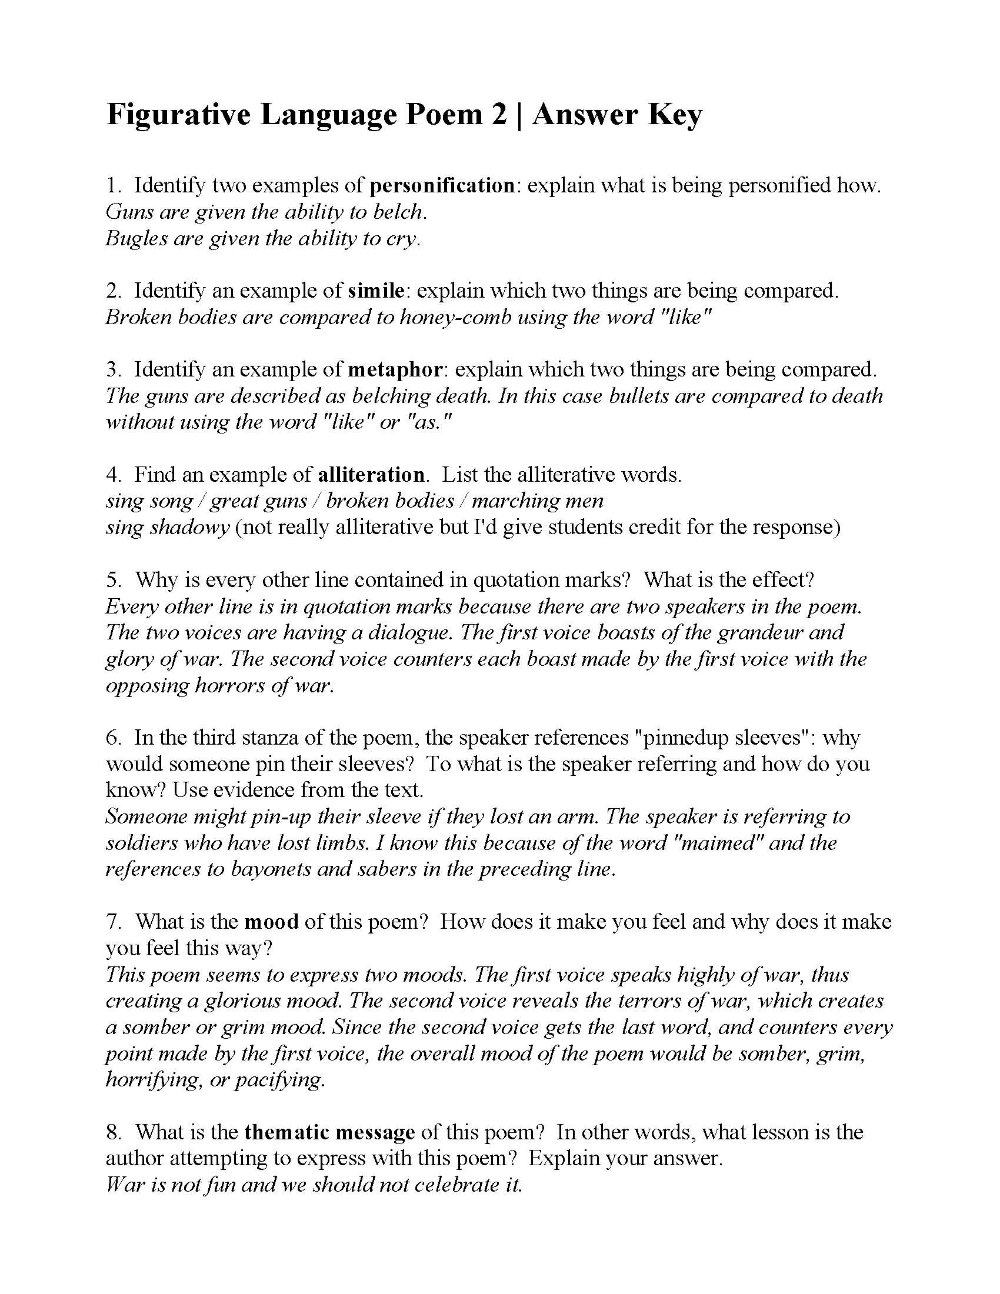 hight resolution of Figurative Language Poem 2: I Sing the Battle by Harry Kemp   Answers   Figurative  language poems